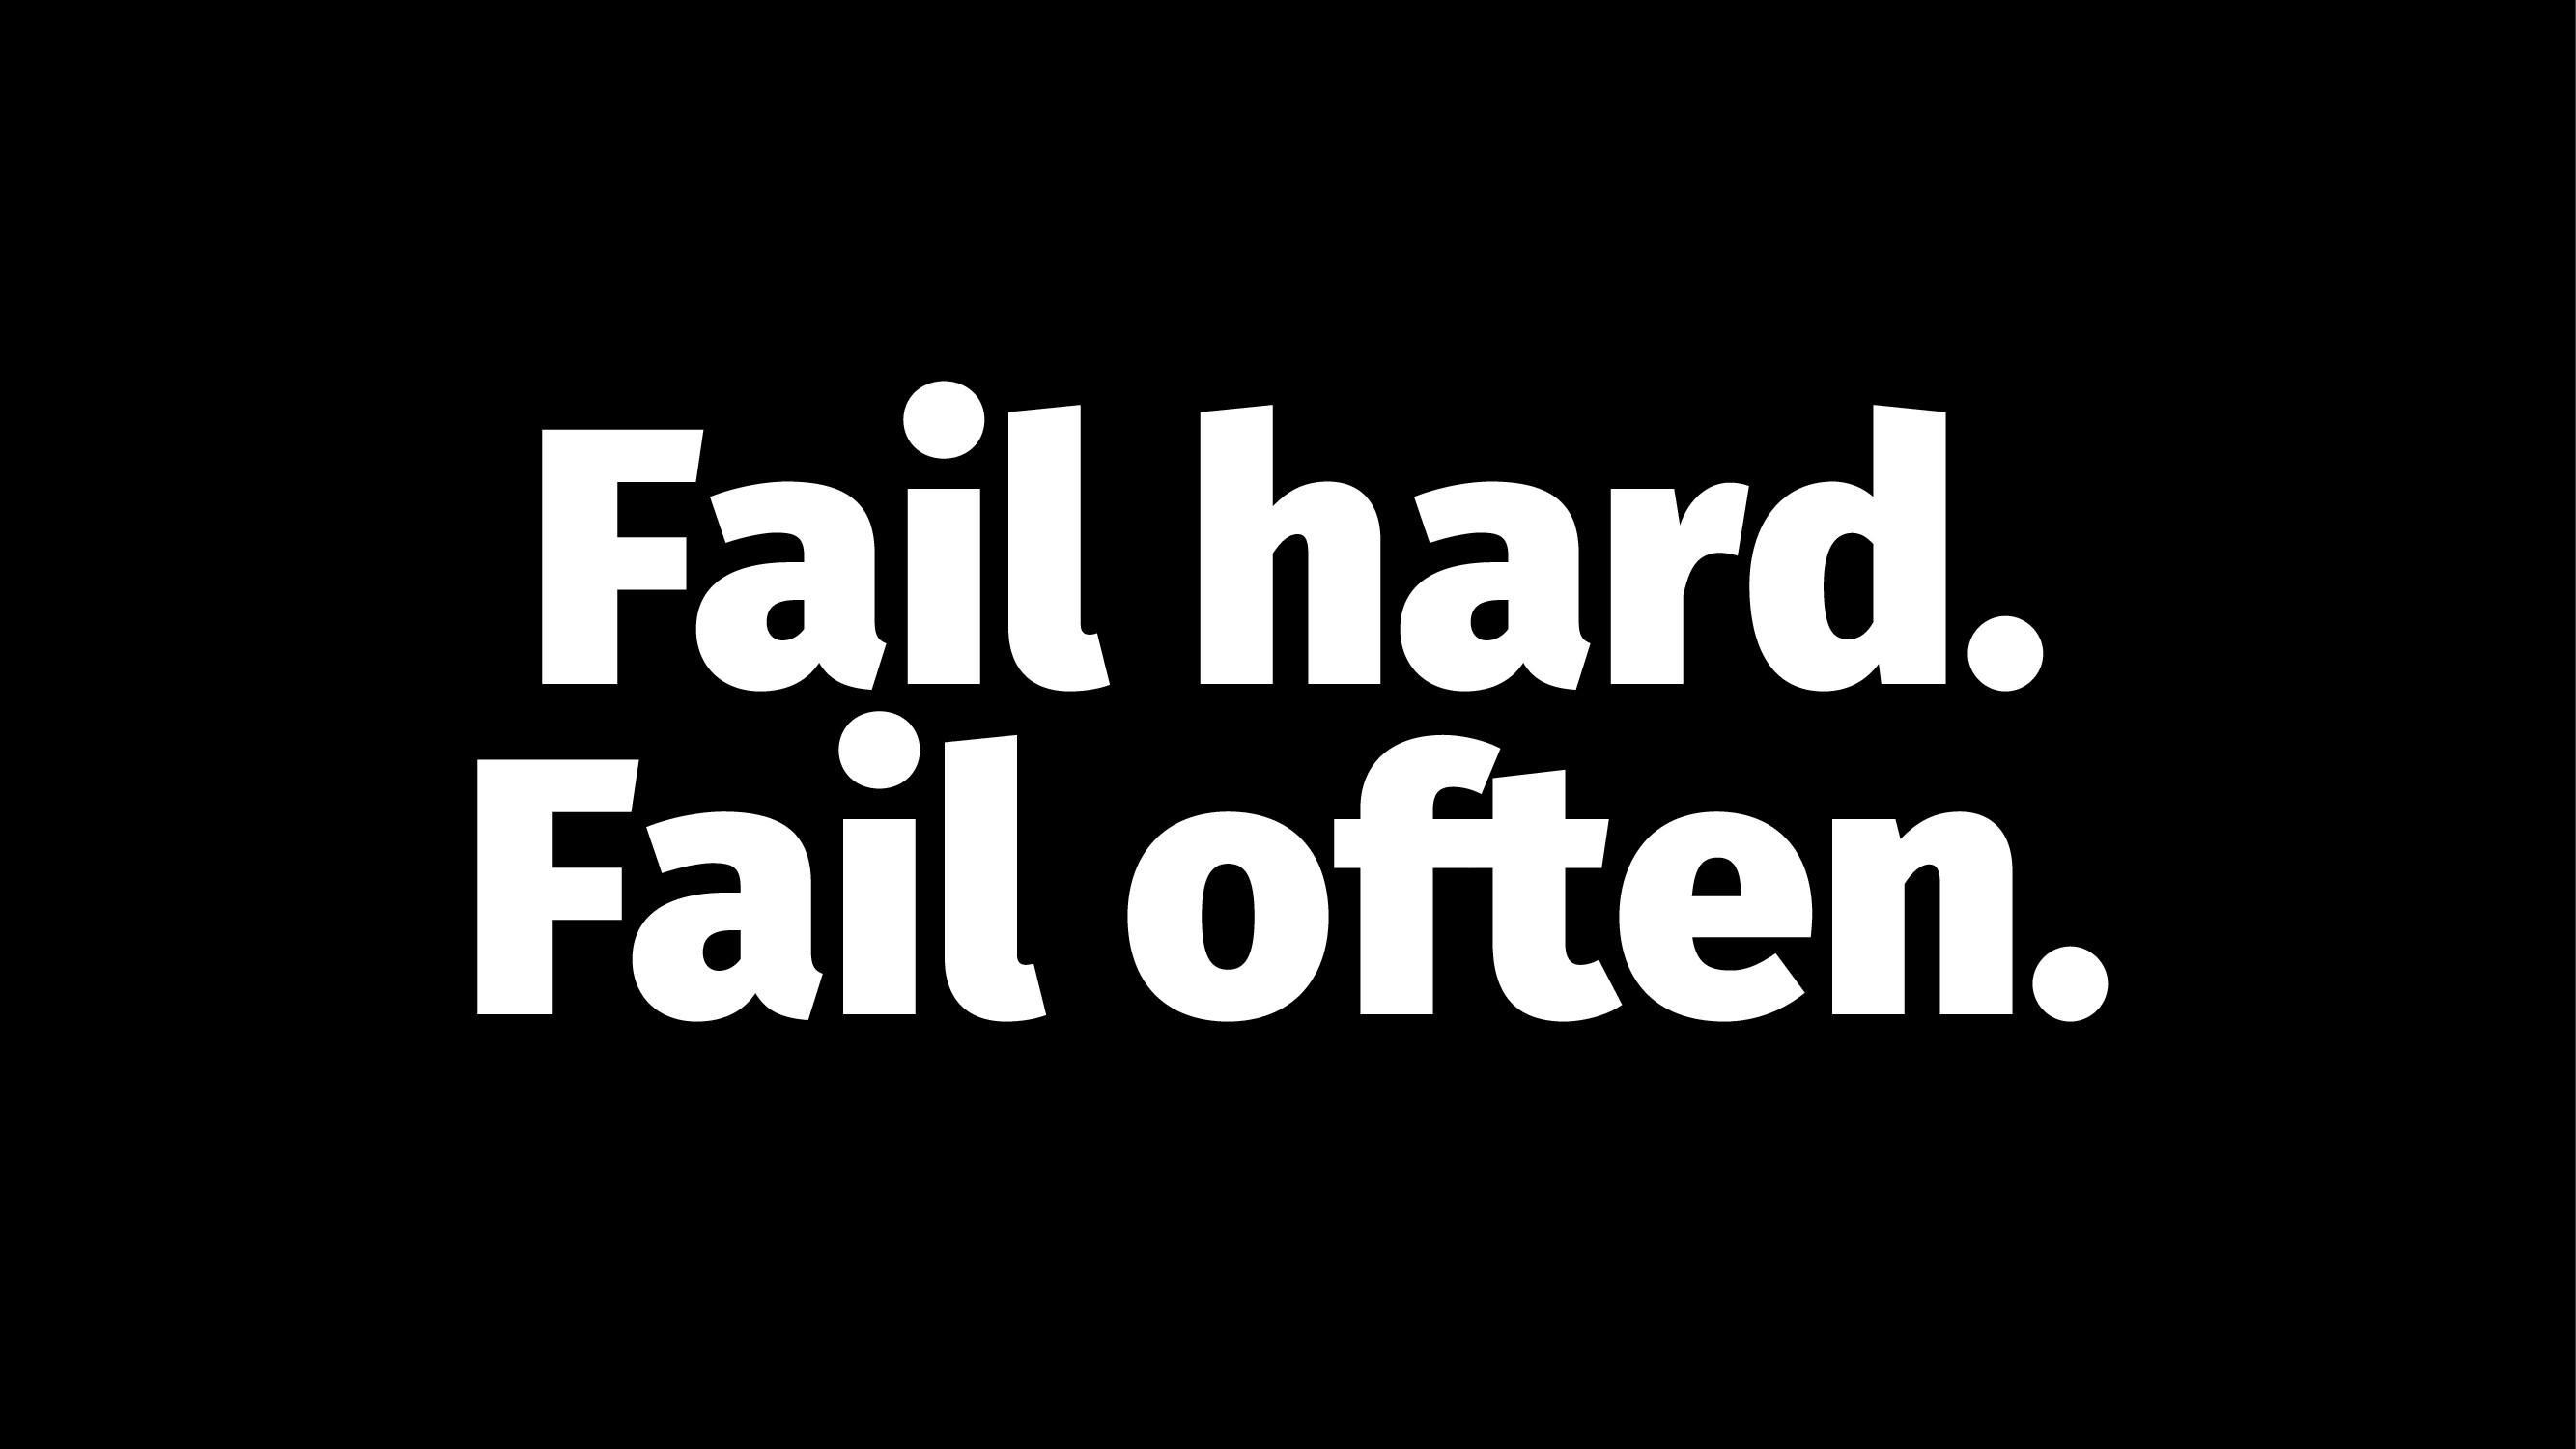 Fail hard. Fail often.